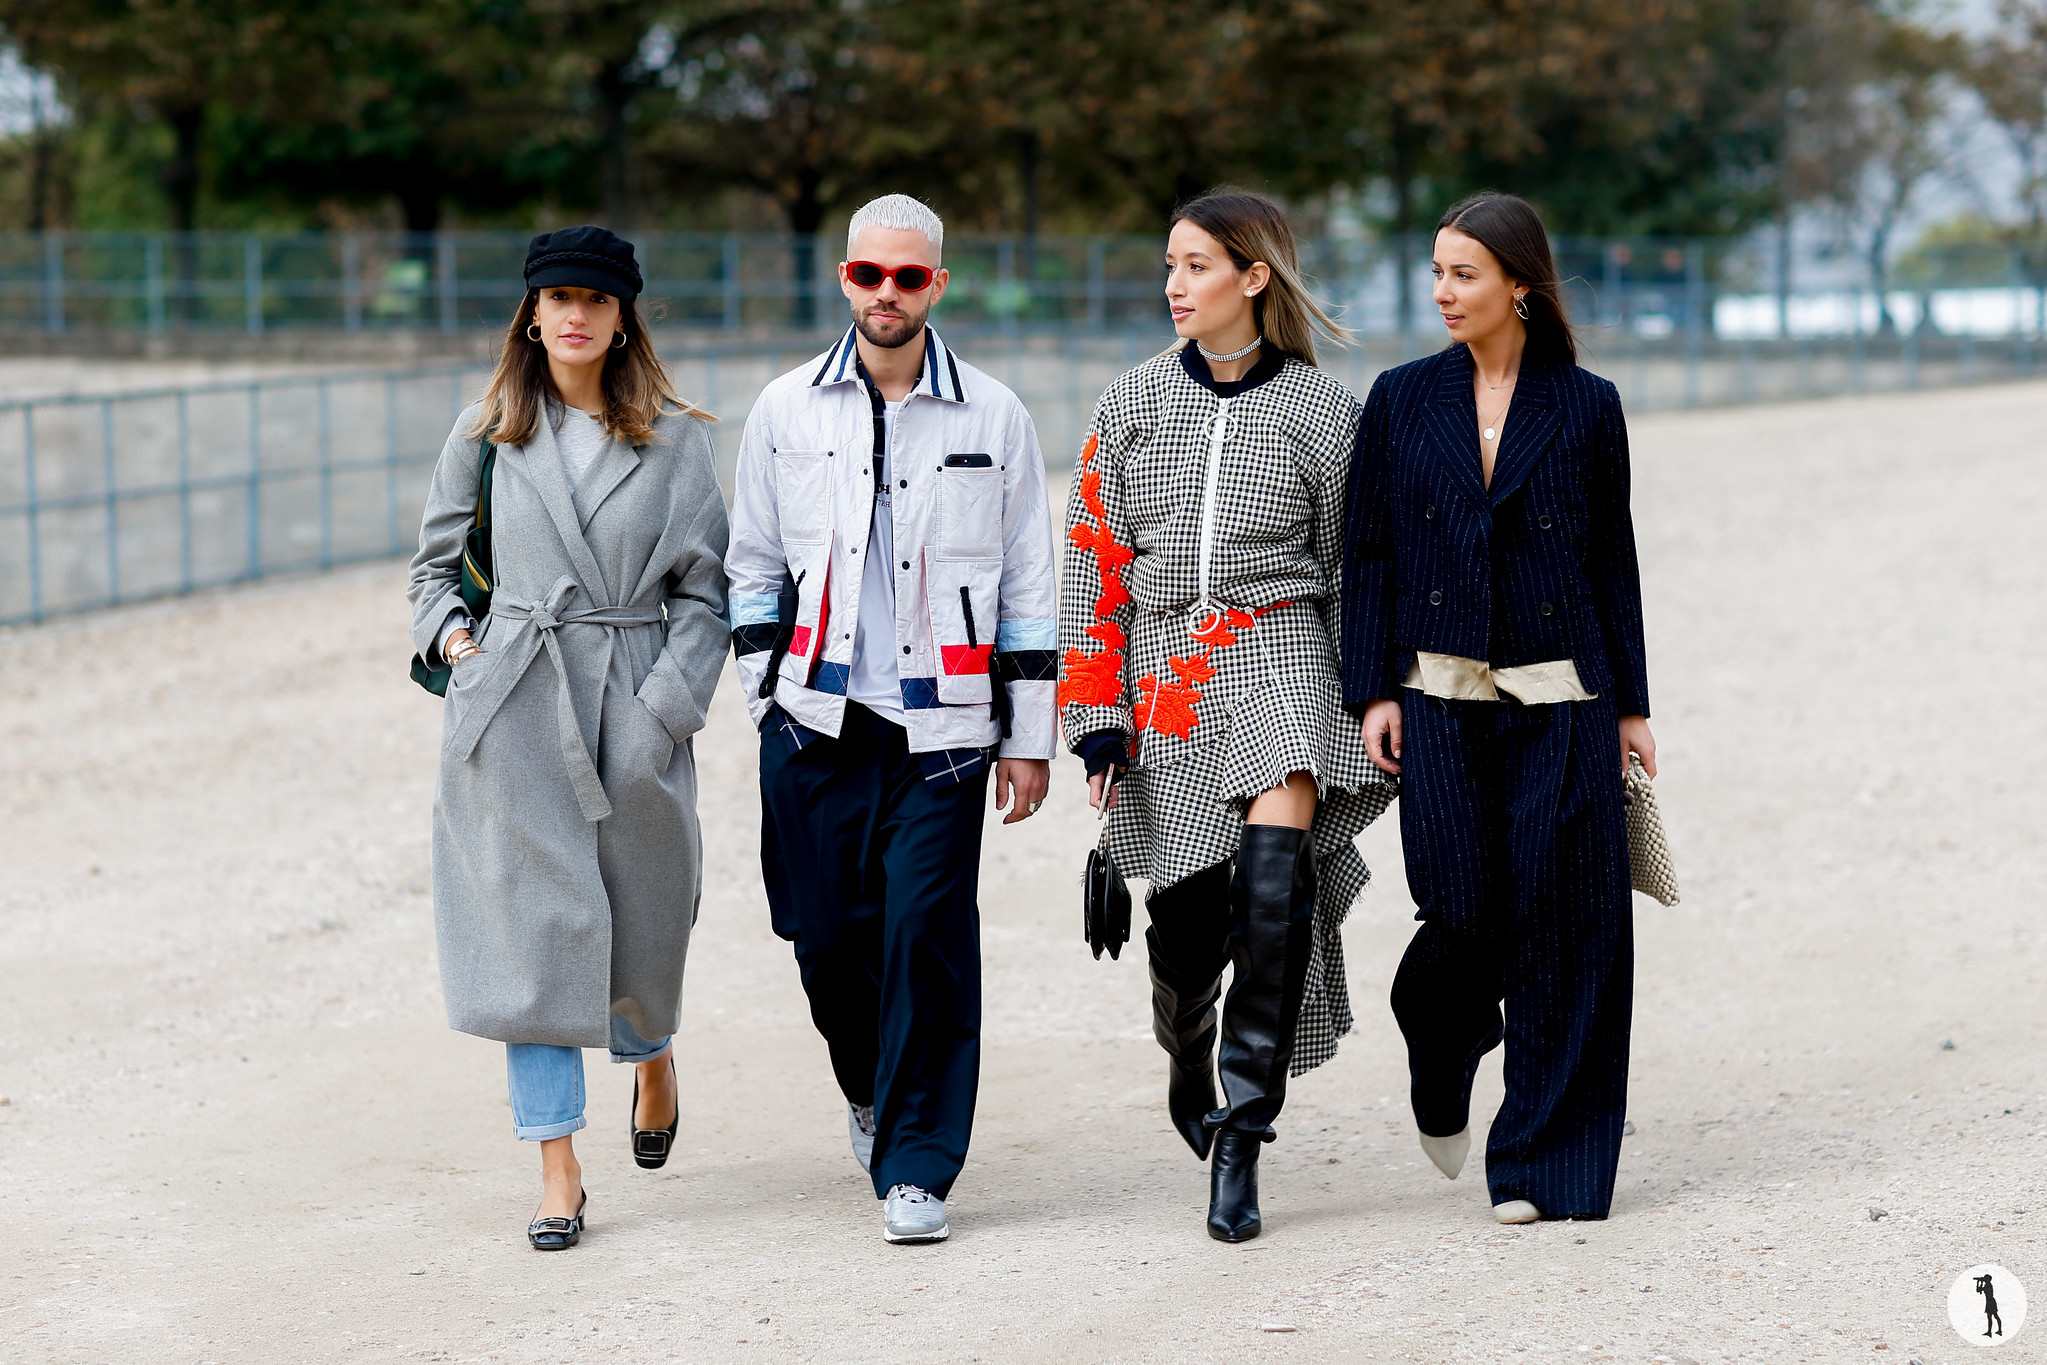 Kenza Sadoun el Glaoui, Js and Alice Jaimetoutcheztoi, Alex Closet - Paris Fashion Week SS18 (1)